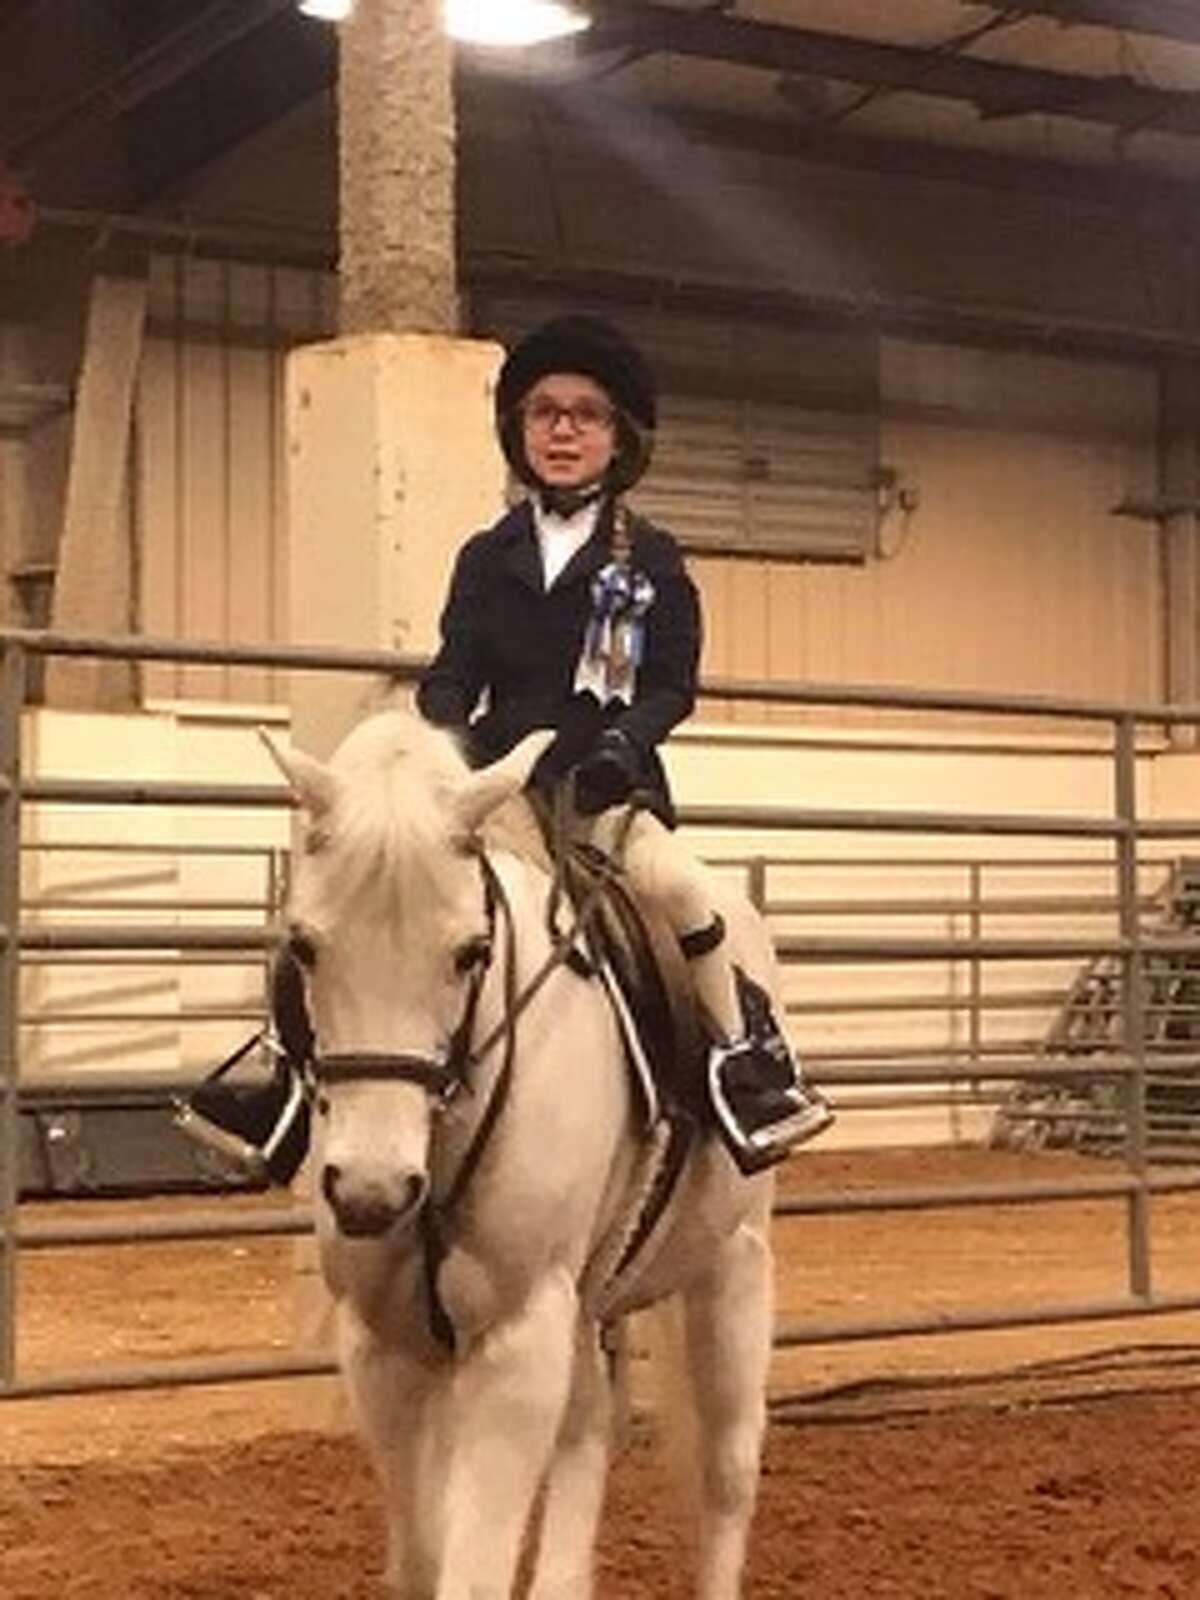 Horse show: Chloe Vines